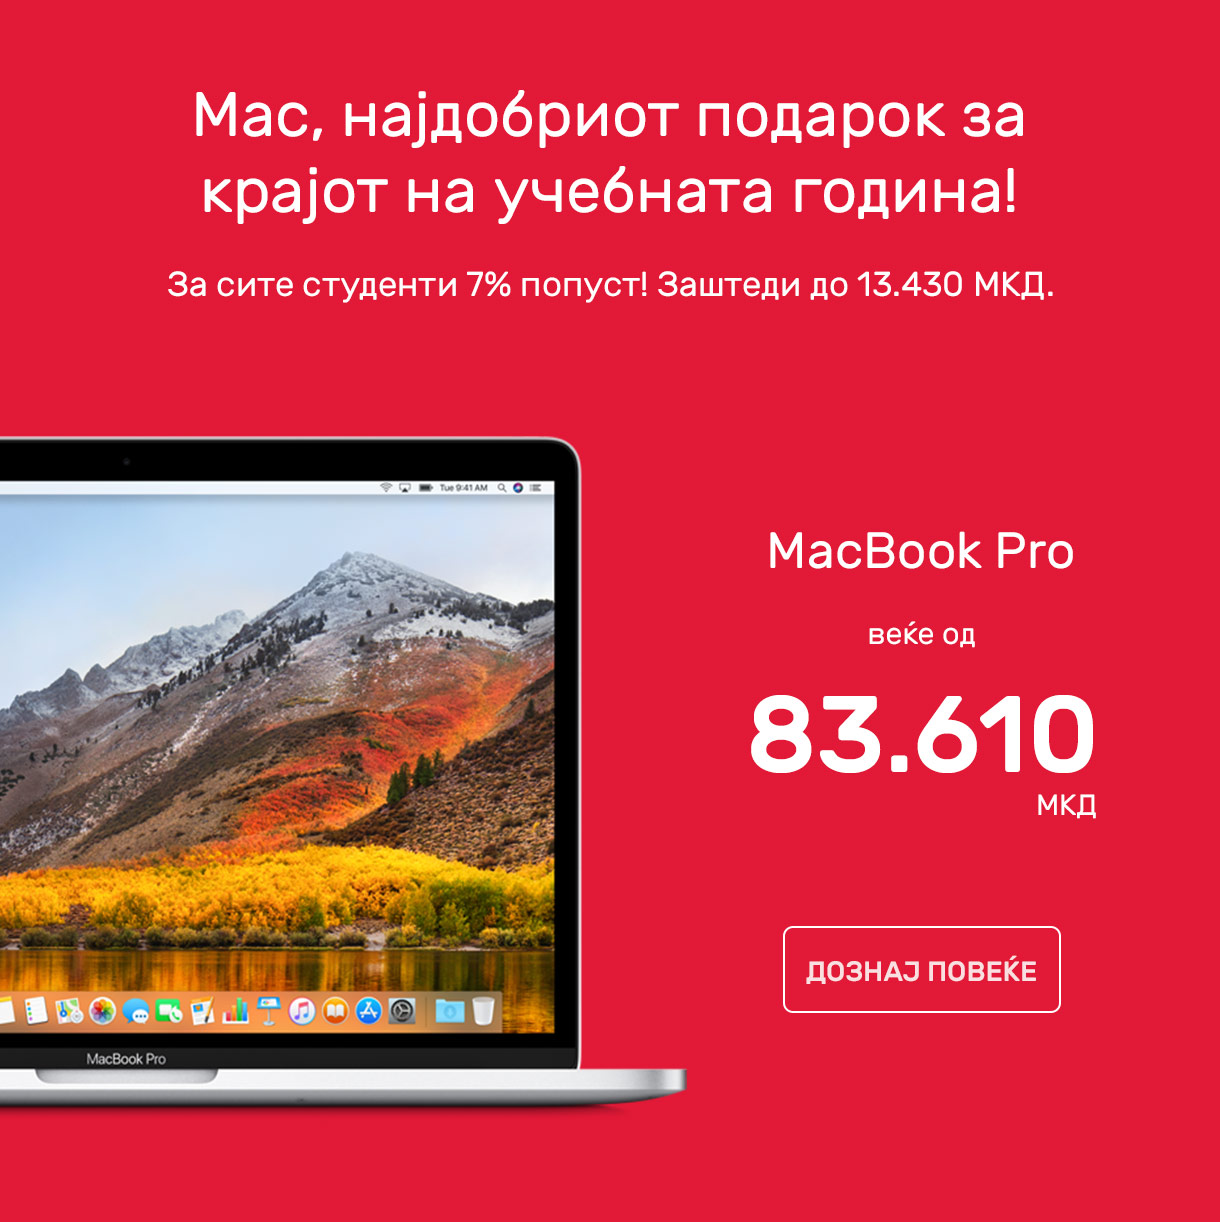 Mac, Perfect student gift